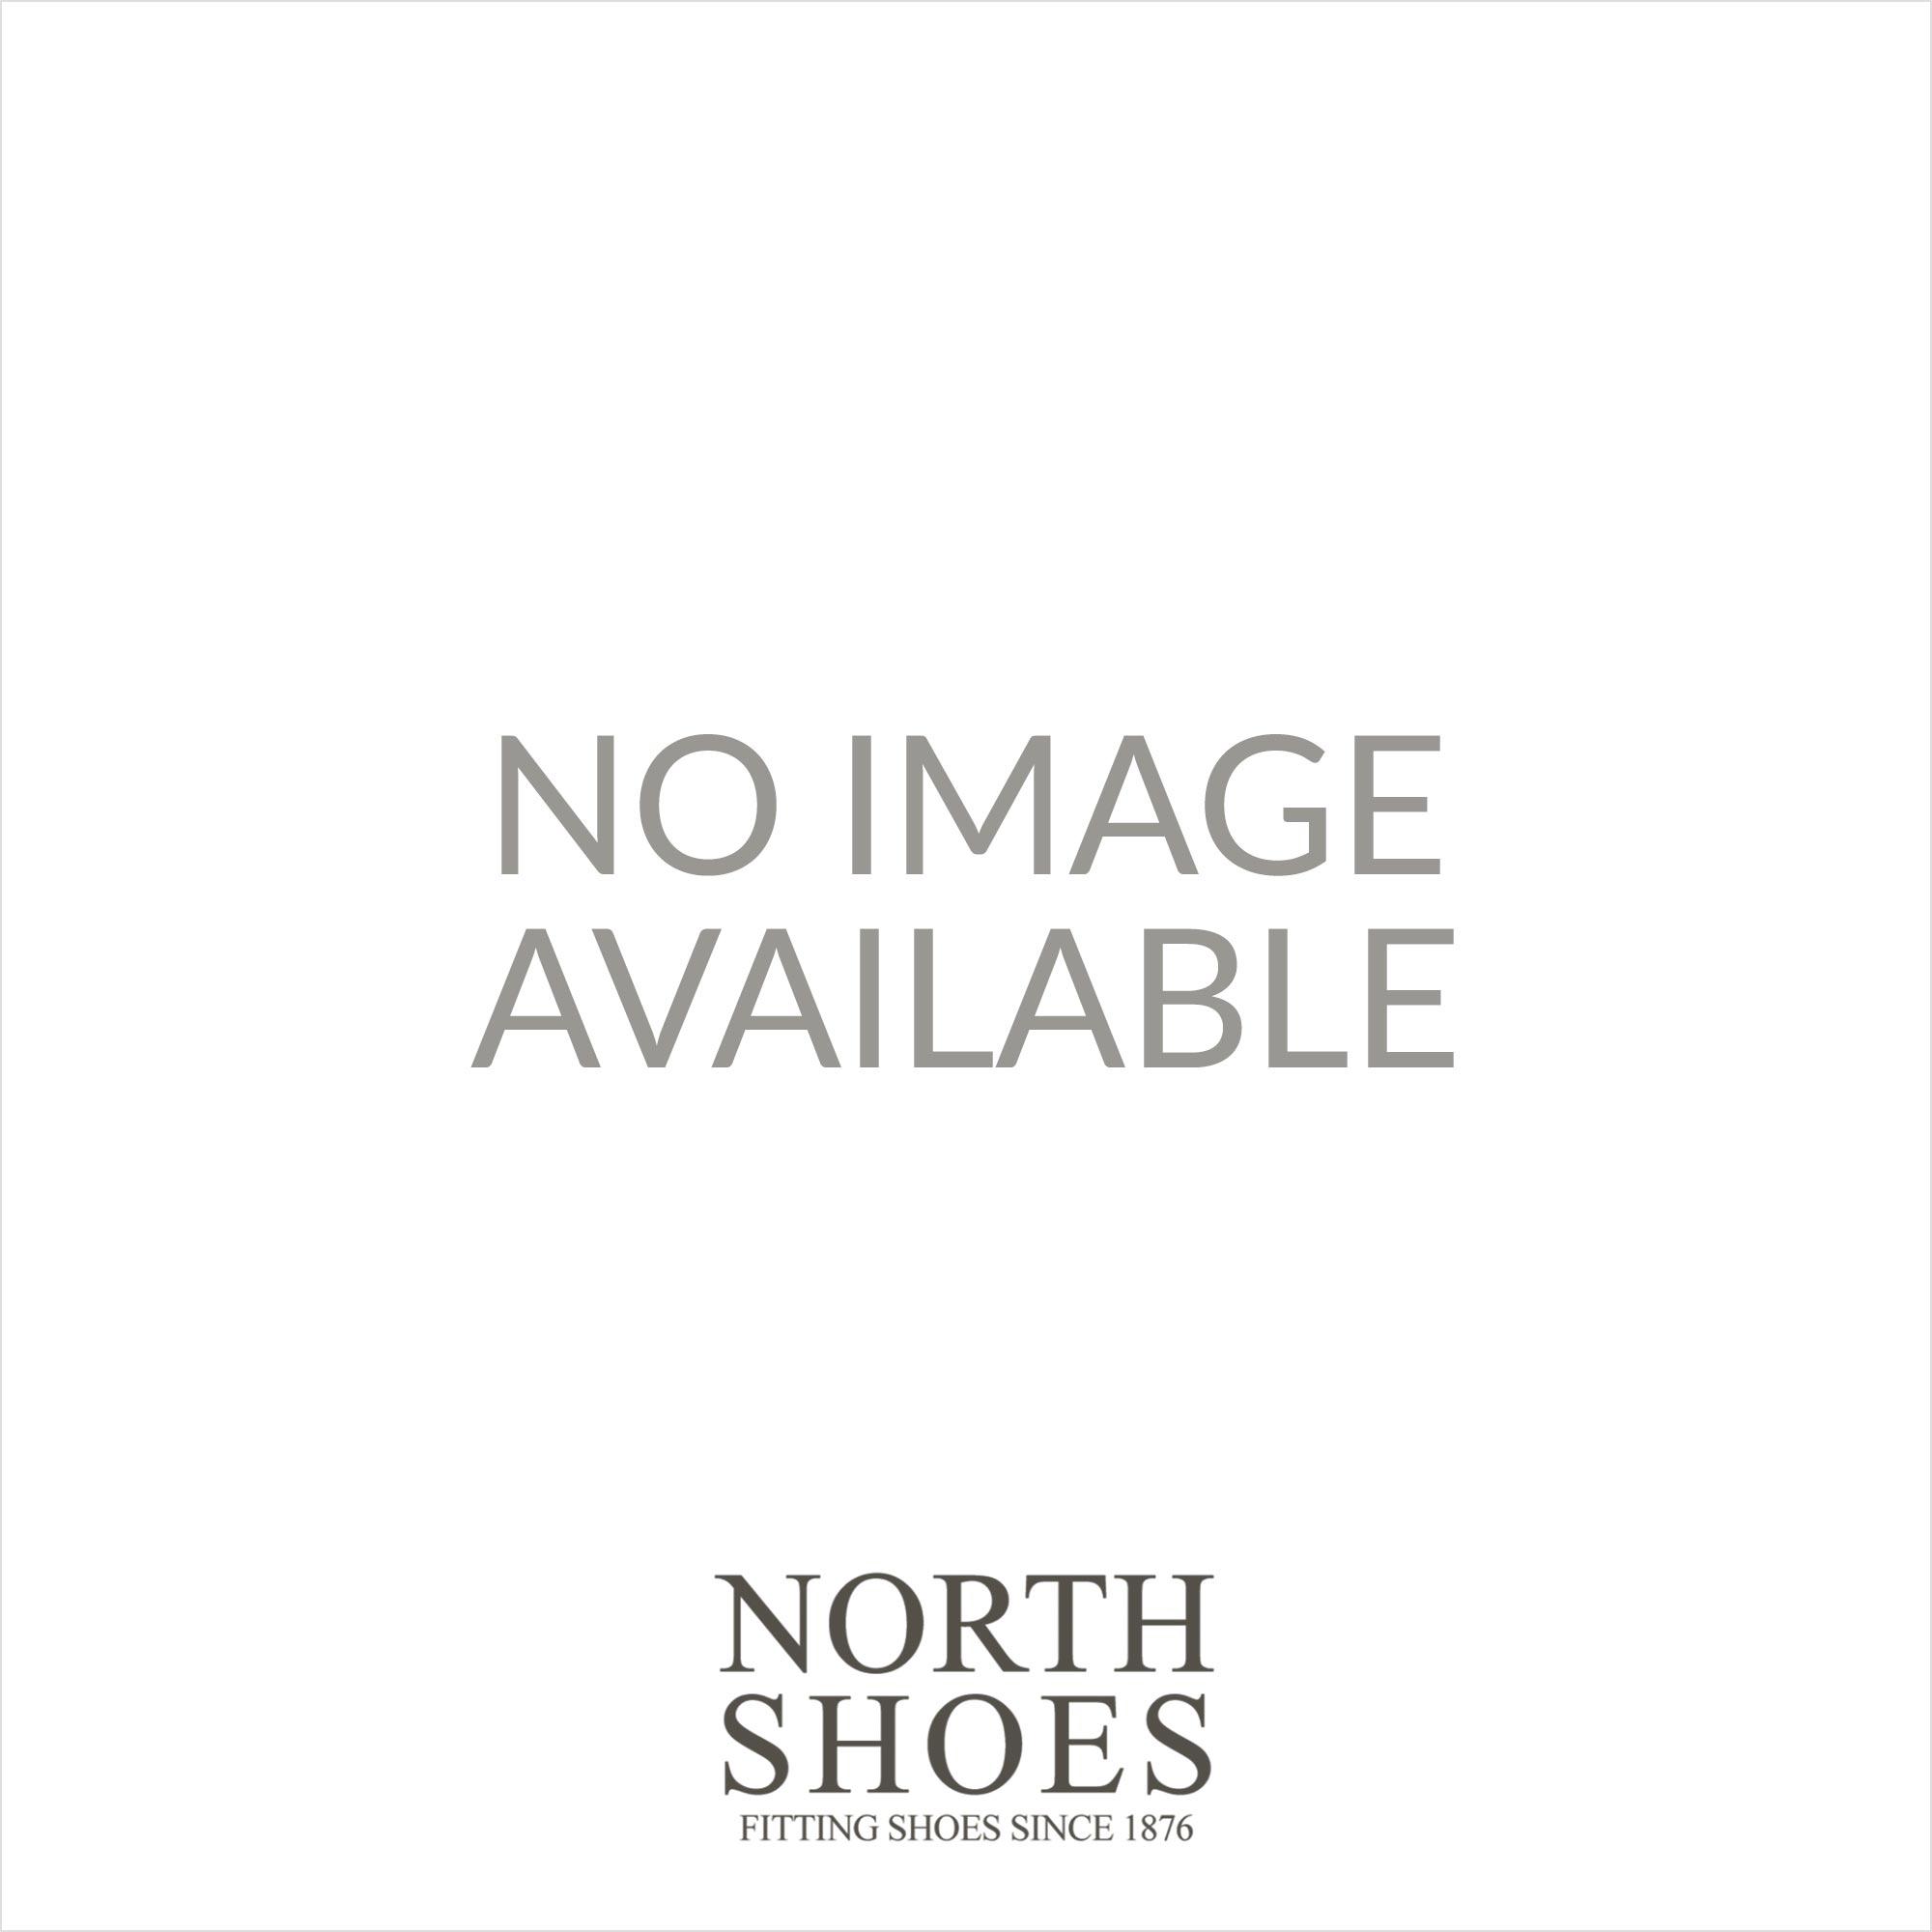 526cc906f92f6 Drama 95.709-17 Black Suede Leather Womens Stiletto Heel Long Leg Boots